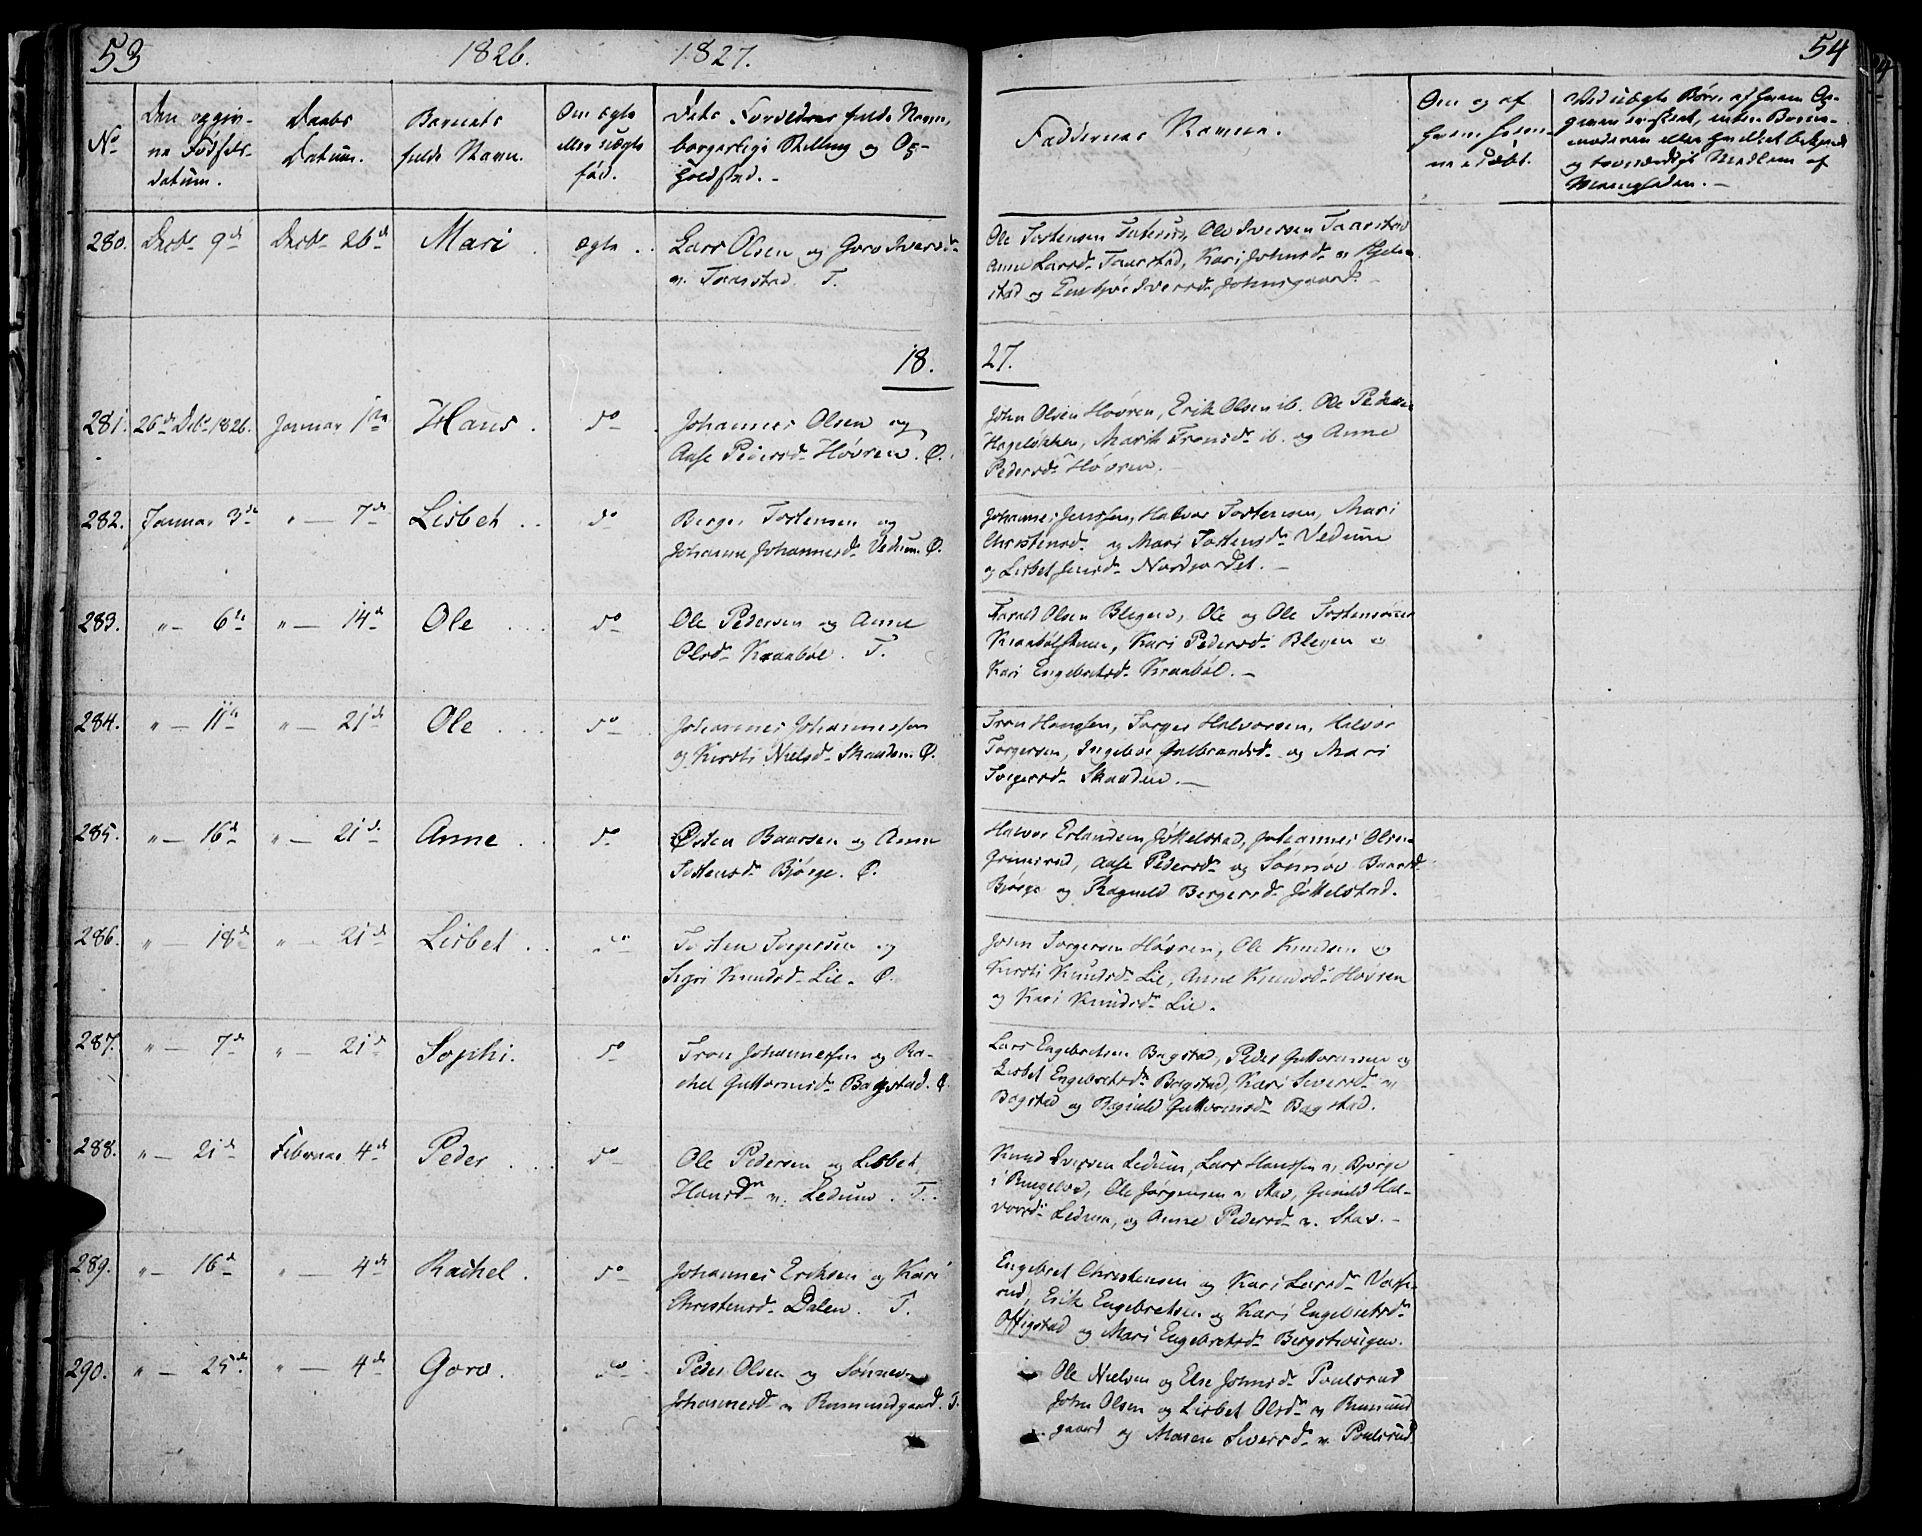 SAH, Øyer prestekontor, Ministerialbok nr. 4, 1824-1841, s. 53-54